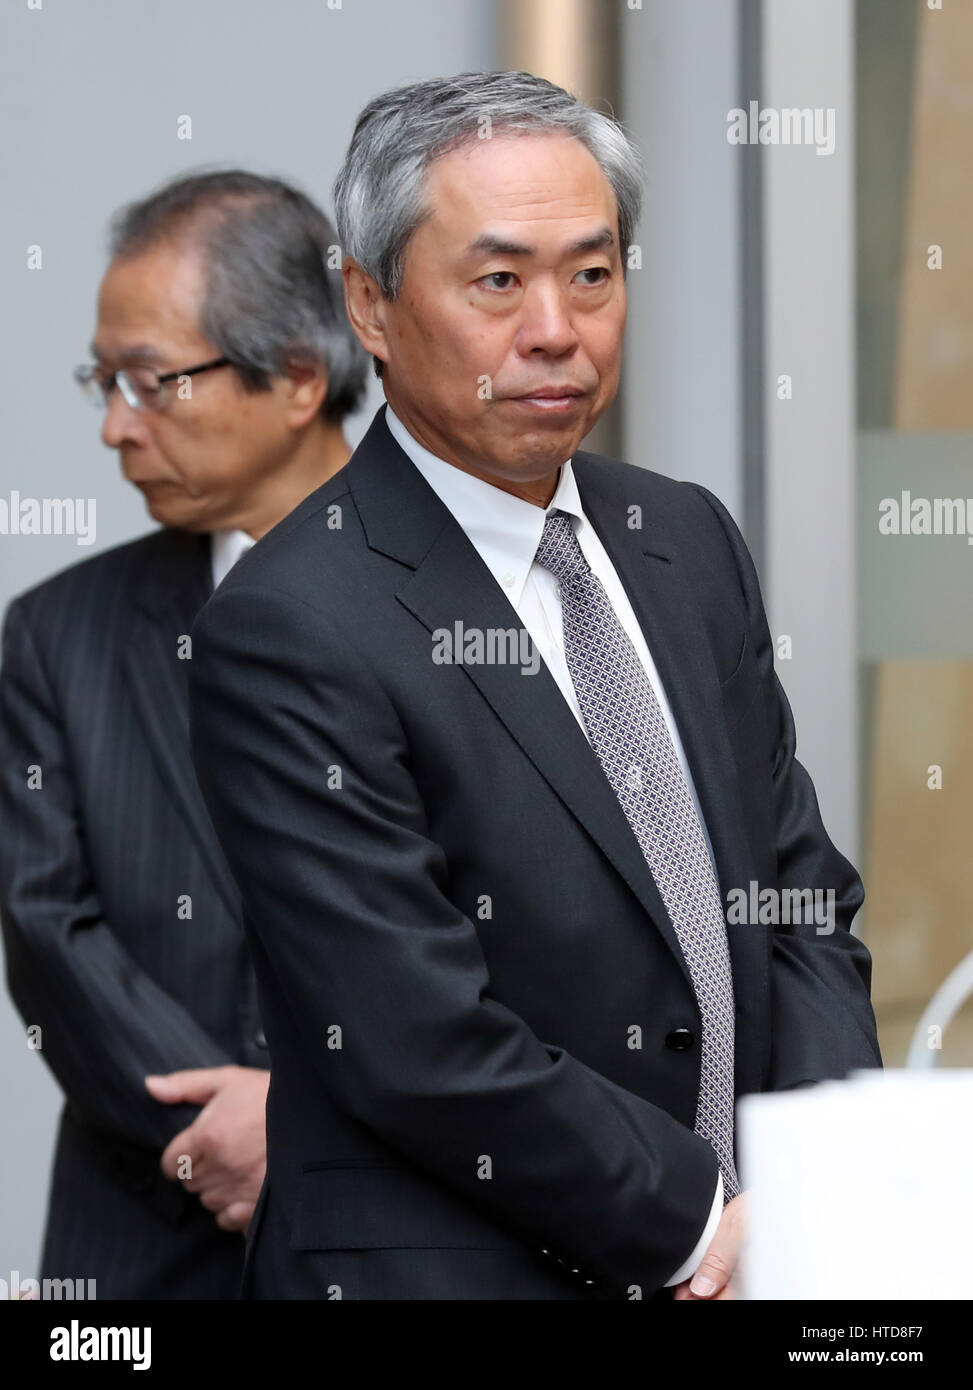 Tokyo, Japan. 10th Mar, 2017. Shingo Tsuji, president of Mori Building participates a disaster drill at the Roppongi Stock Photo